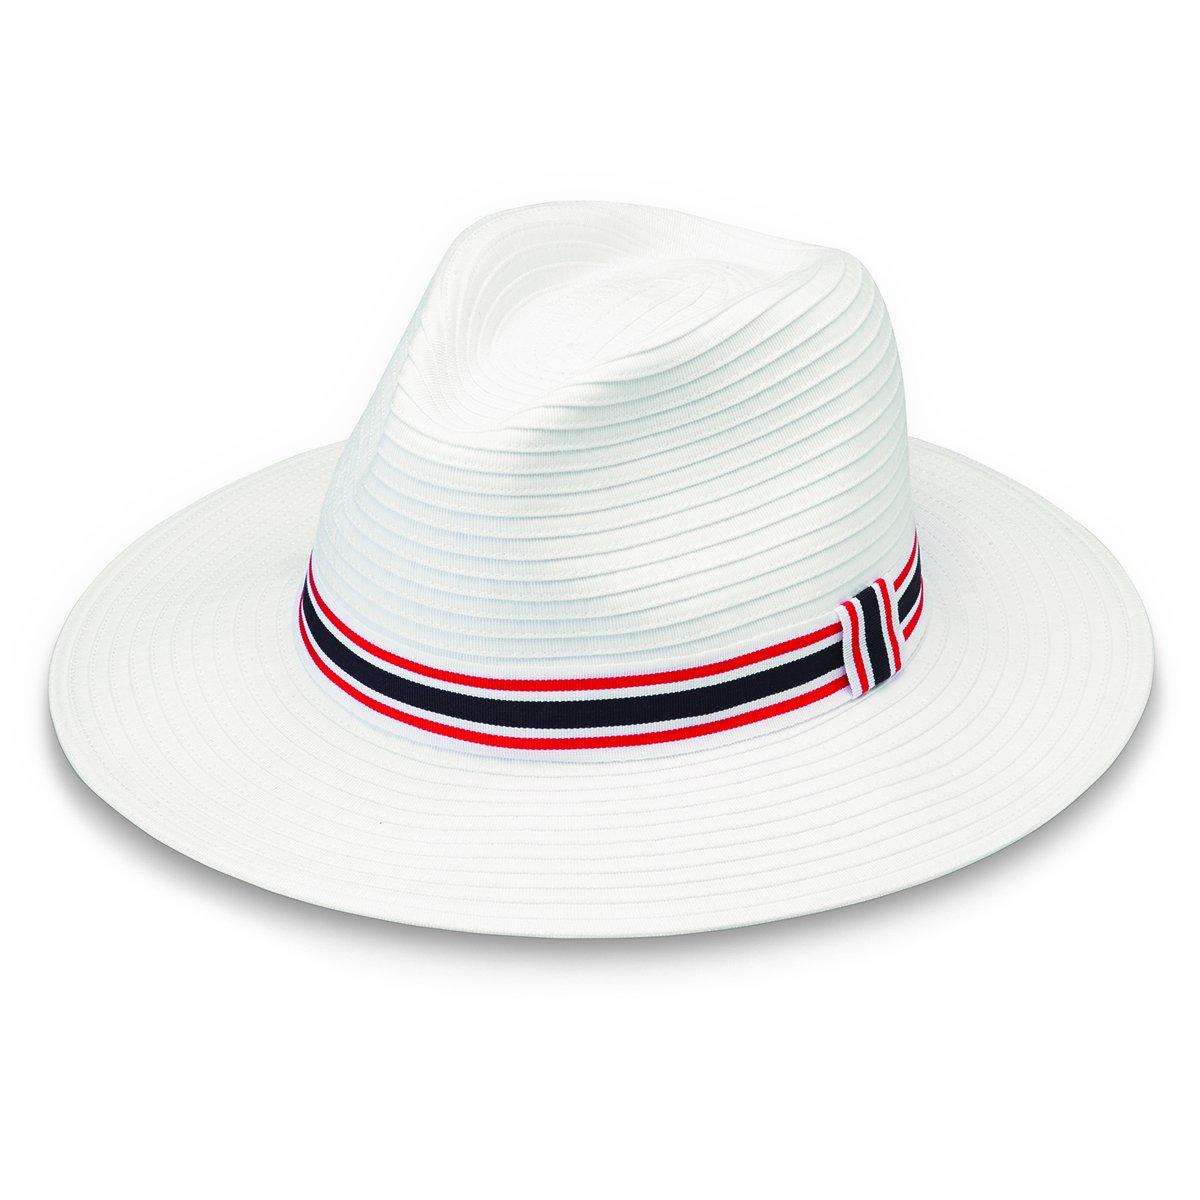 28bfbe65 Wallaroo Hat Company Hamilton Men's Hat- Red/White/Blue L/XL: Amazon.ca:  Clothing & Accessories